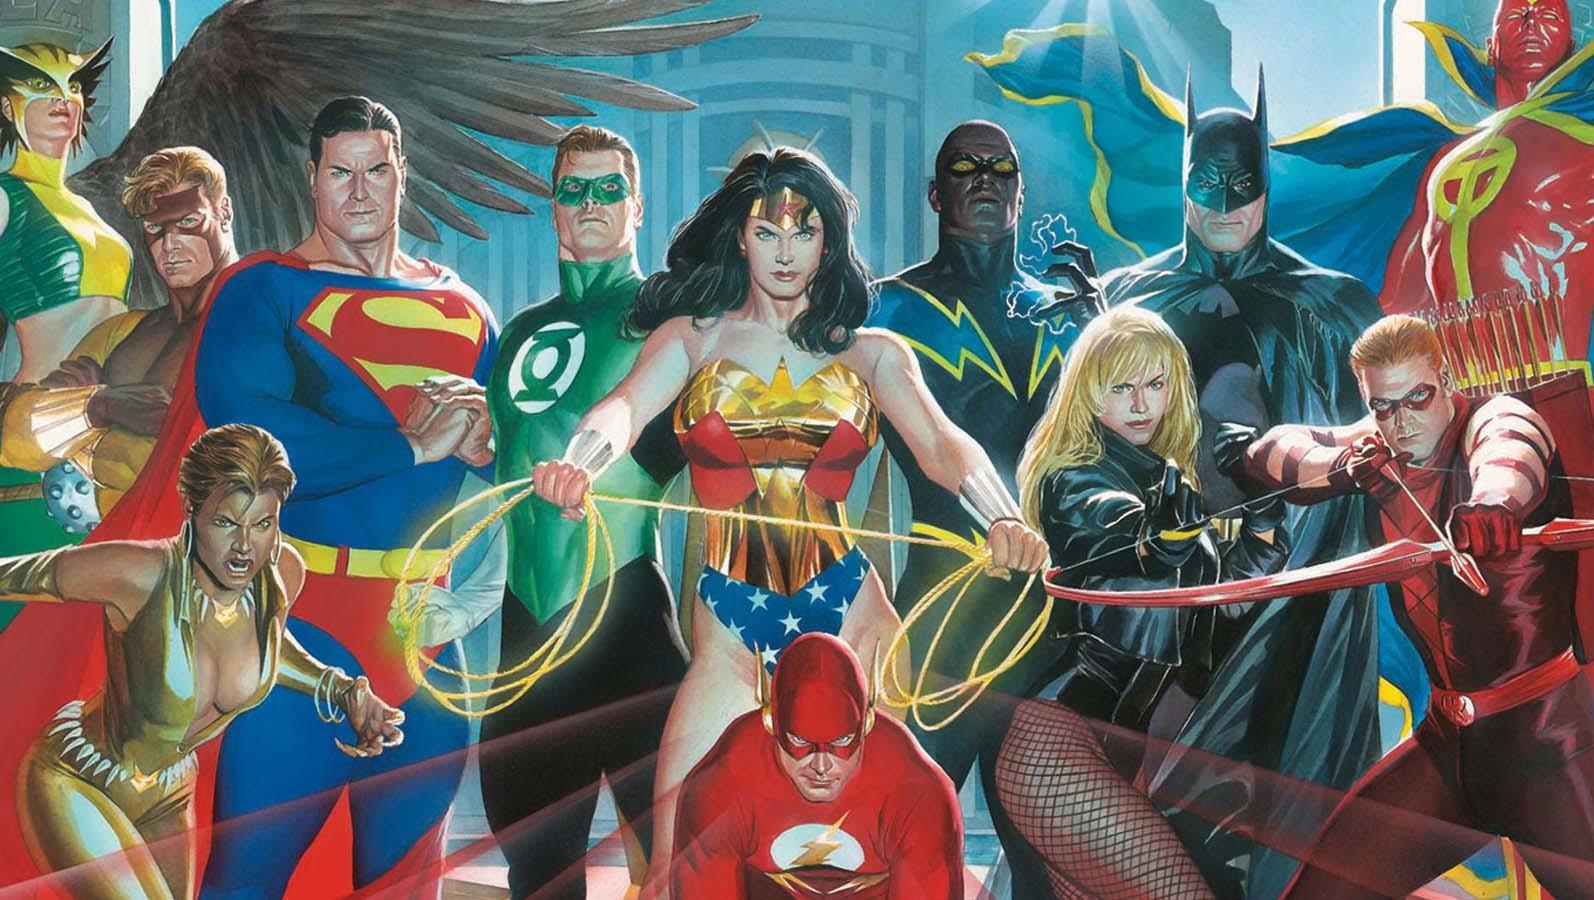 General 1594x900 DC Comics Alex Ross Superman Wonder Woman The Flash Batman Green Lantern Red Tornado Hawkgirl Black Canary Justice League